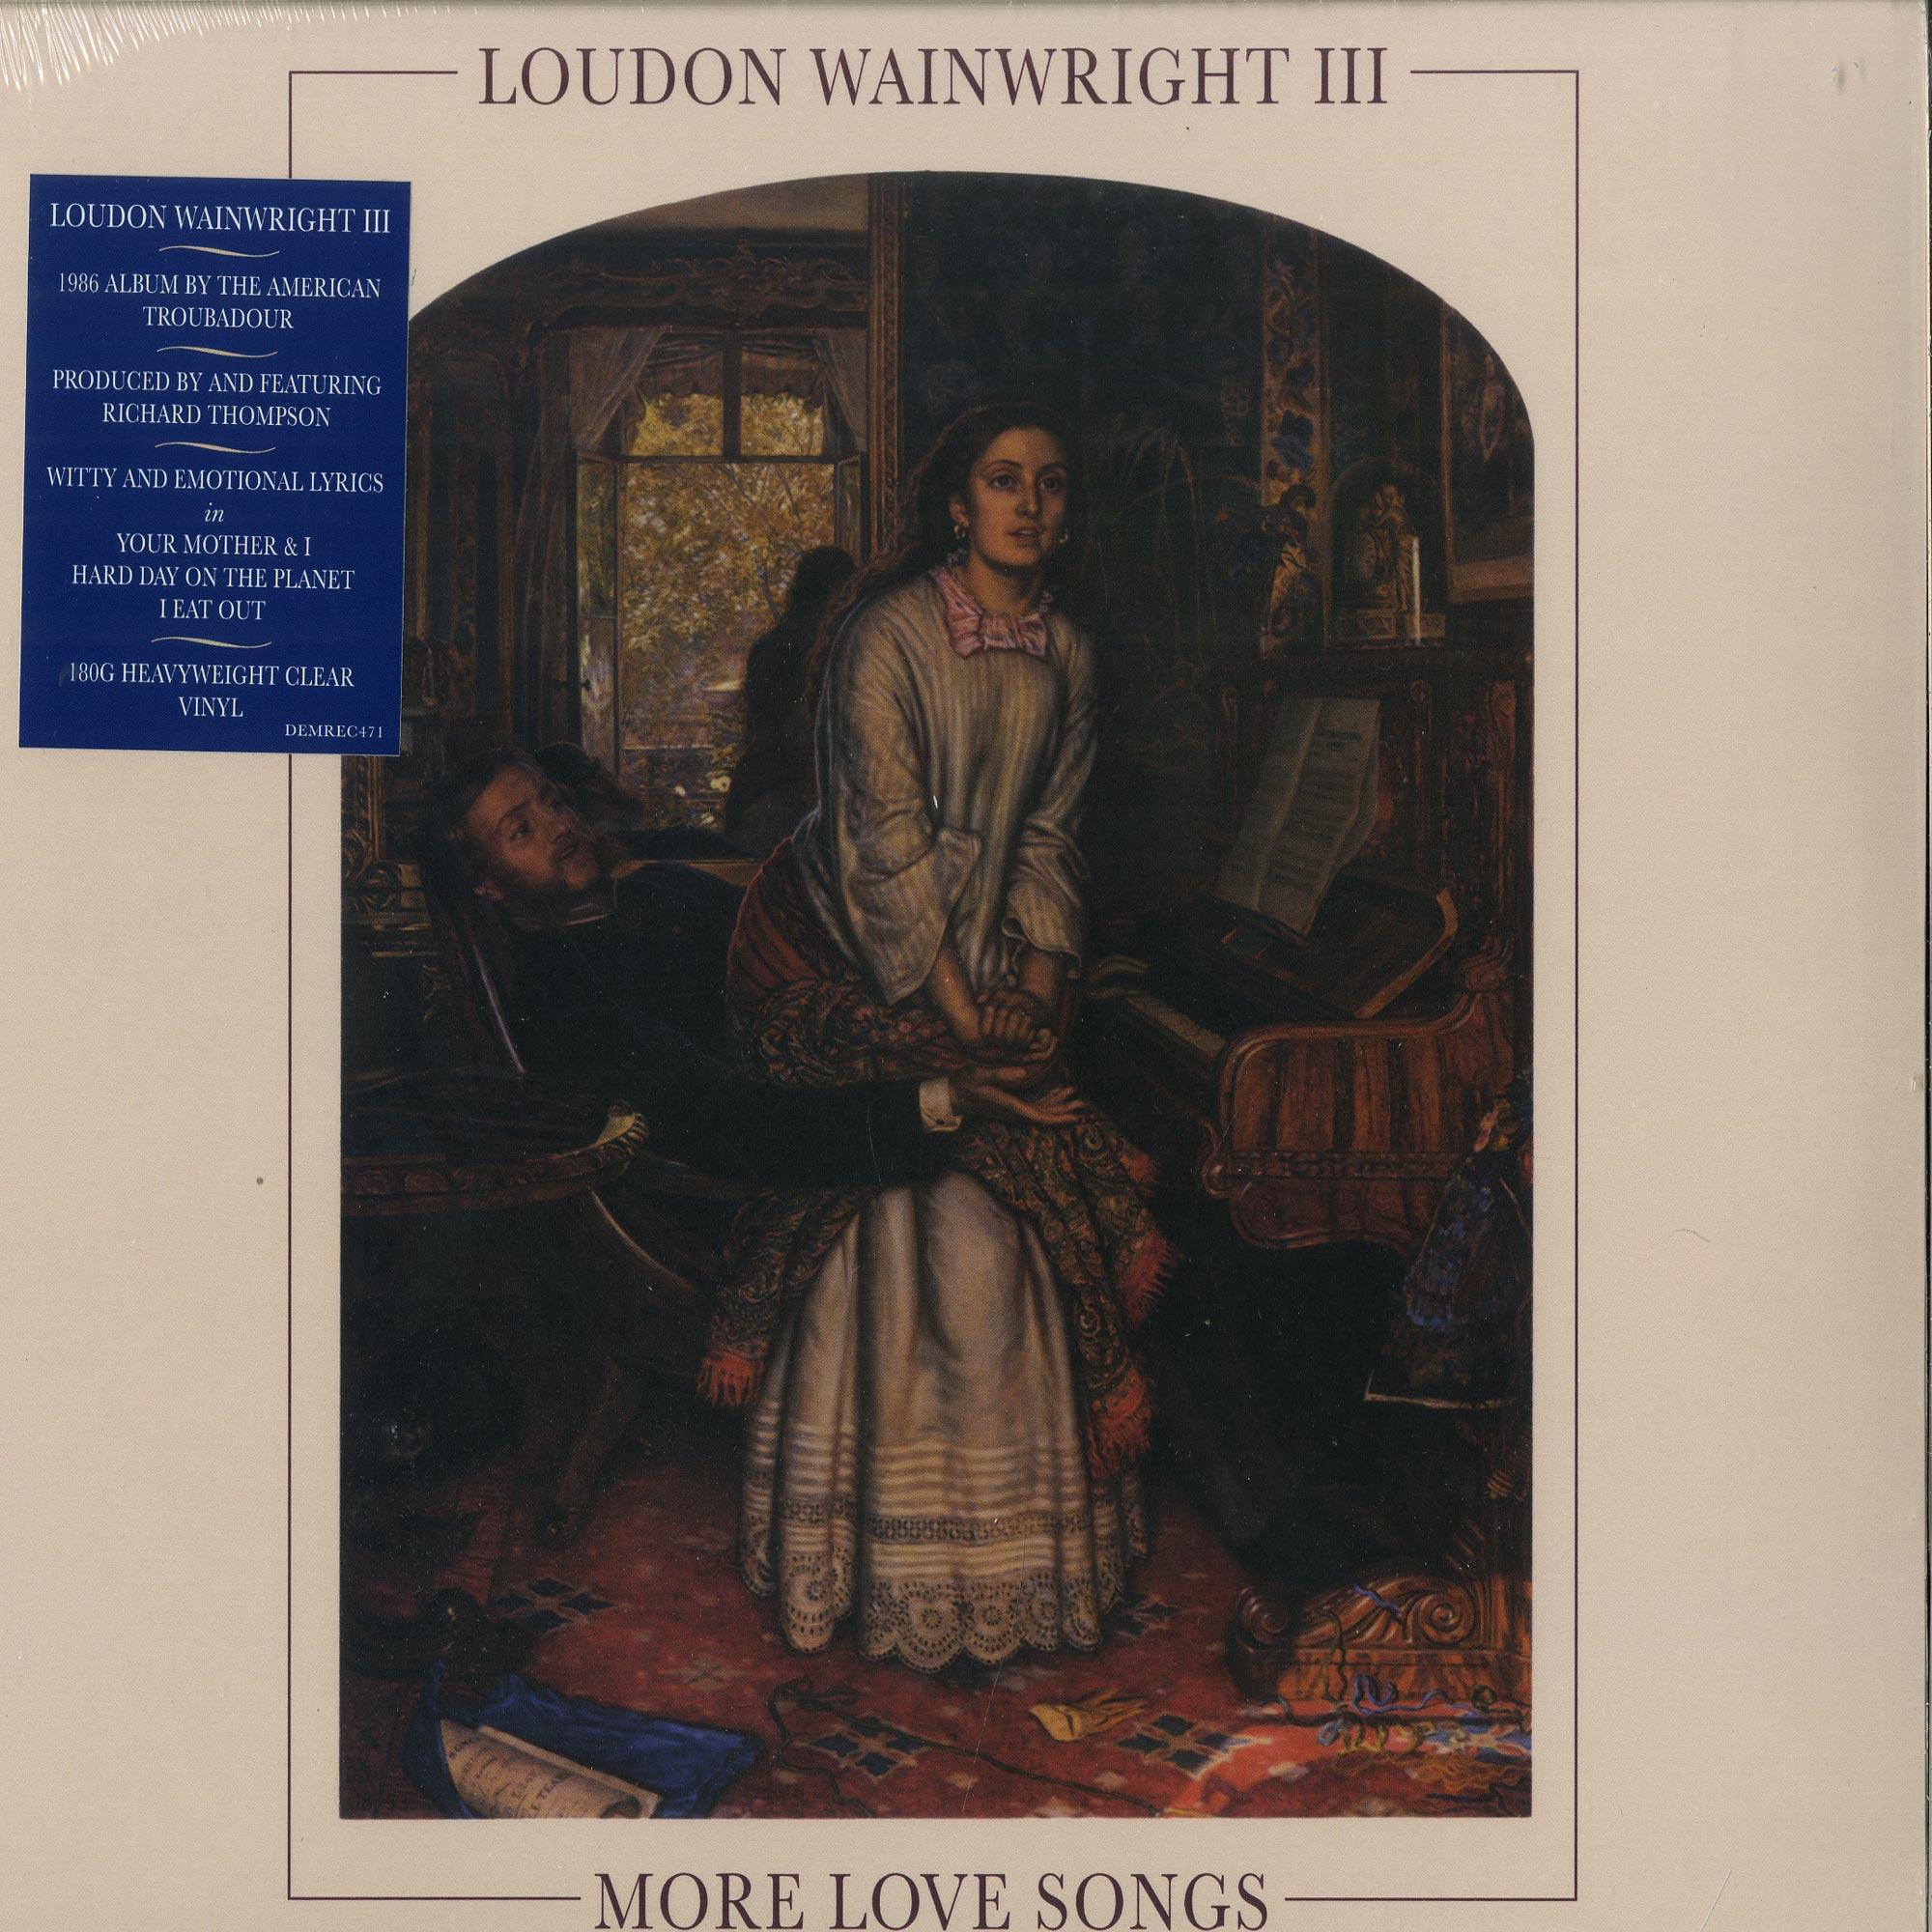 Loudon Wainwright III - MORE LOVE SONGS